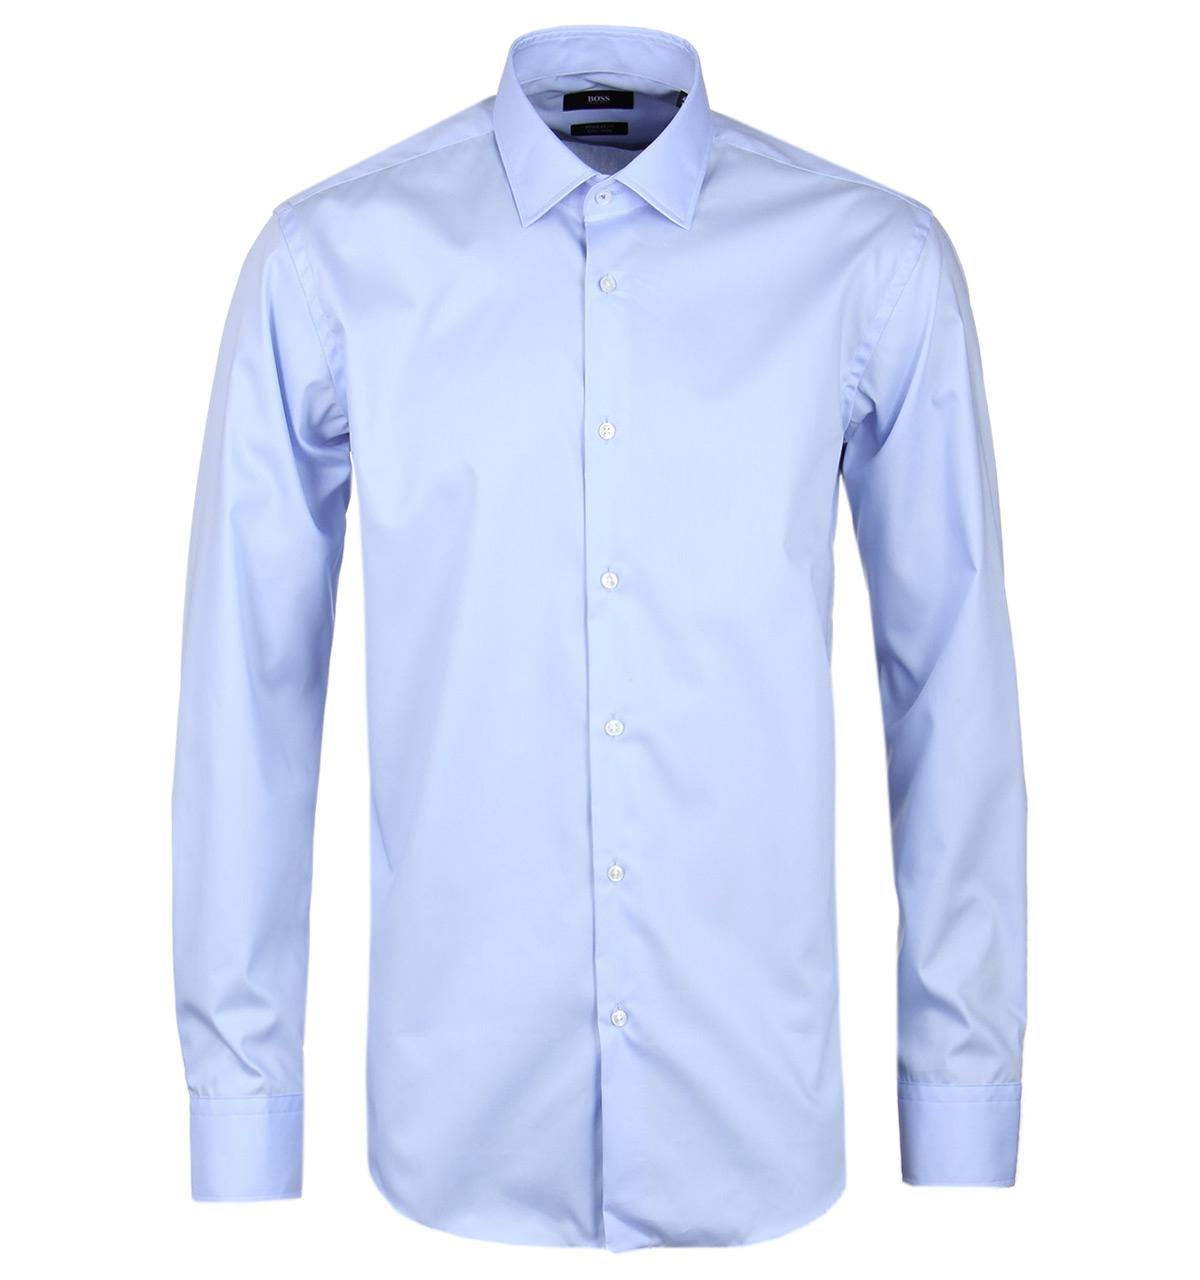 ac183d33 BOSS Gerton Light Blue Regular Fit Easy Iron Shirt in Blue for Men ...